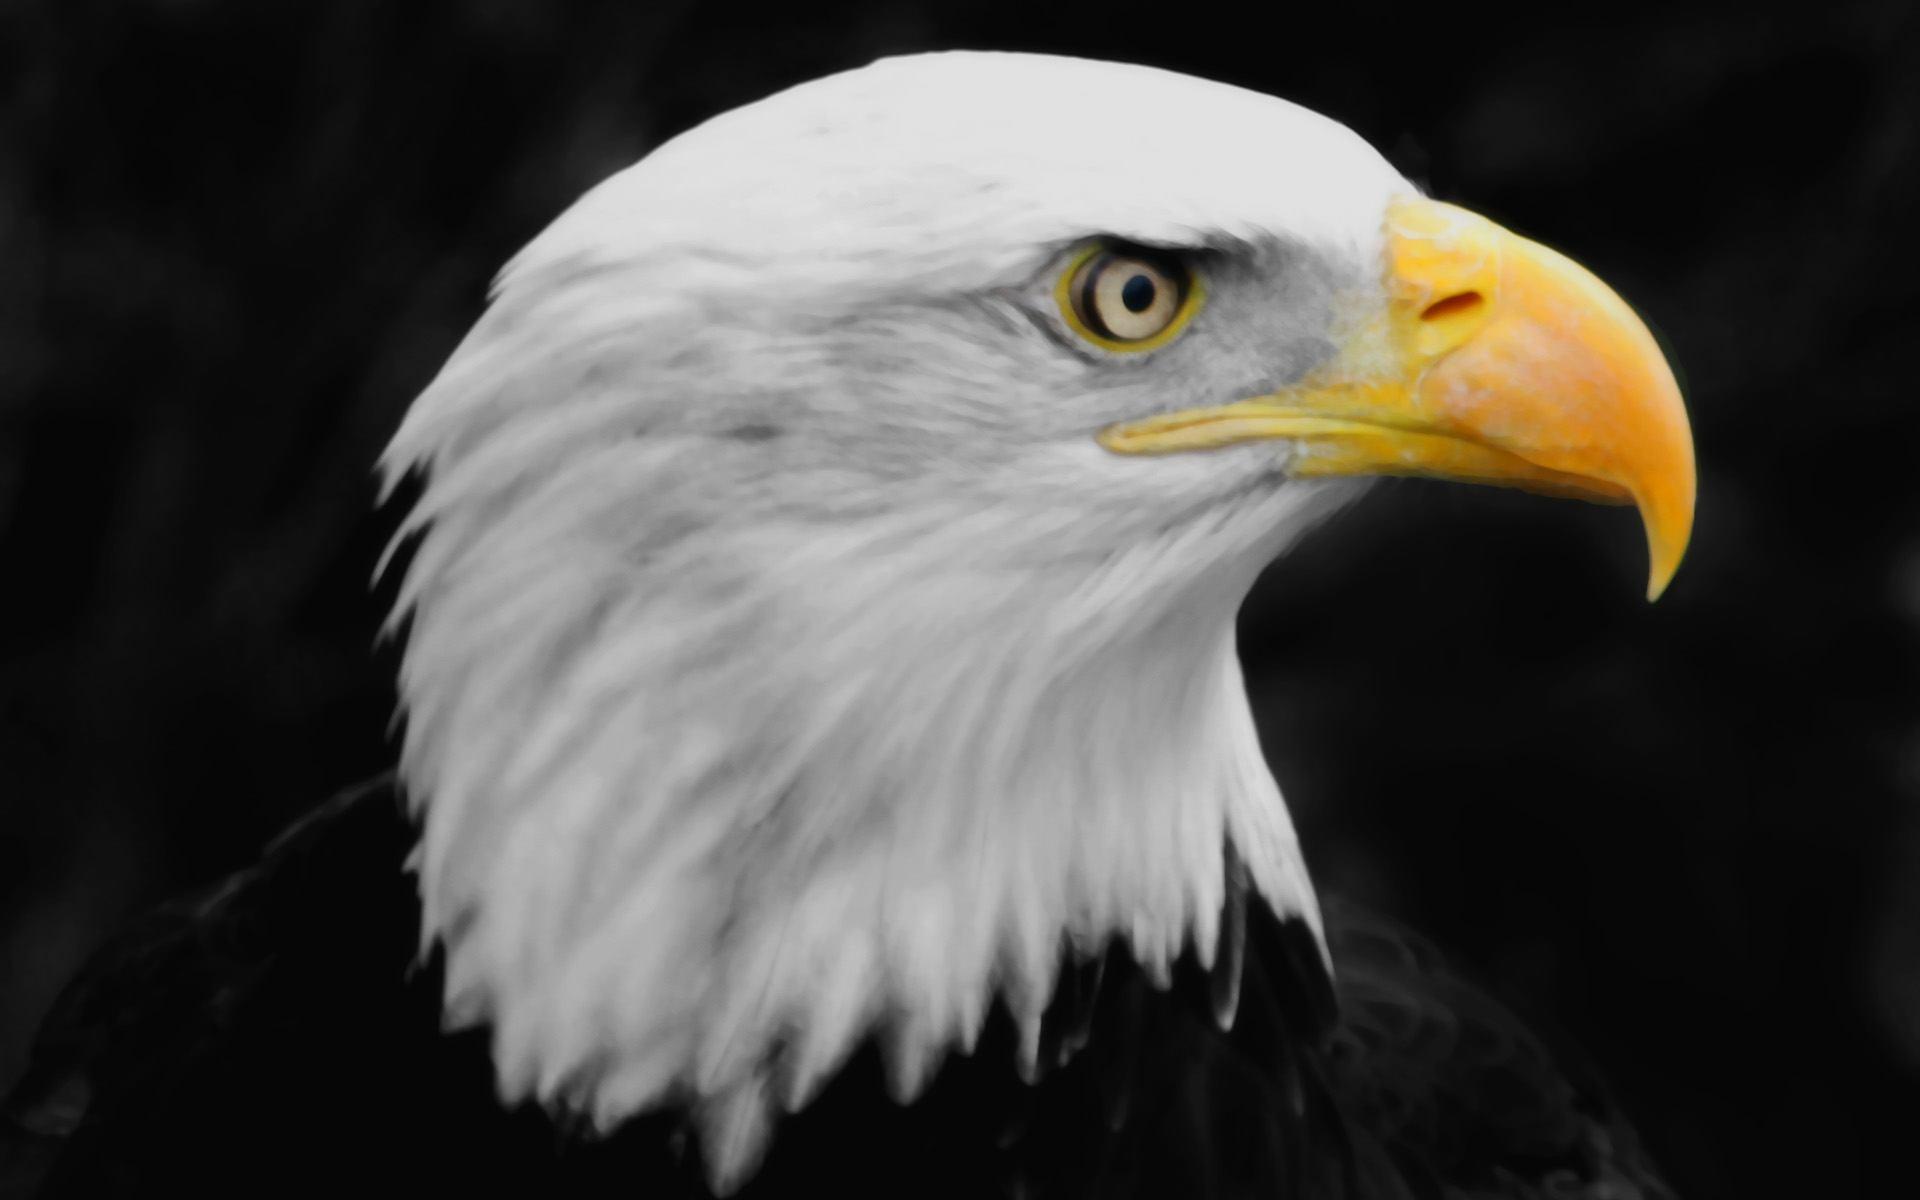 Eagle Head Images Dowload 3d Hd Picture Design Free